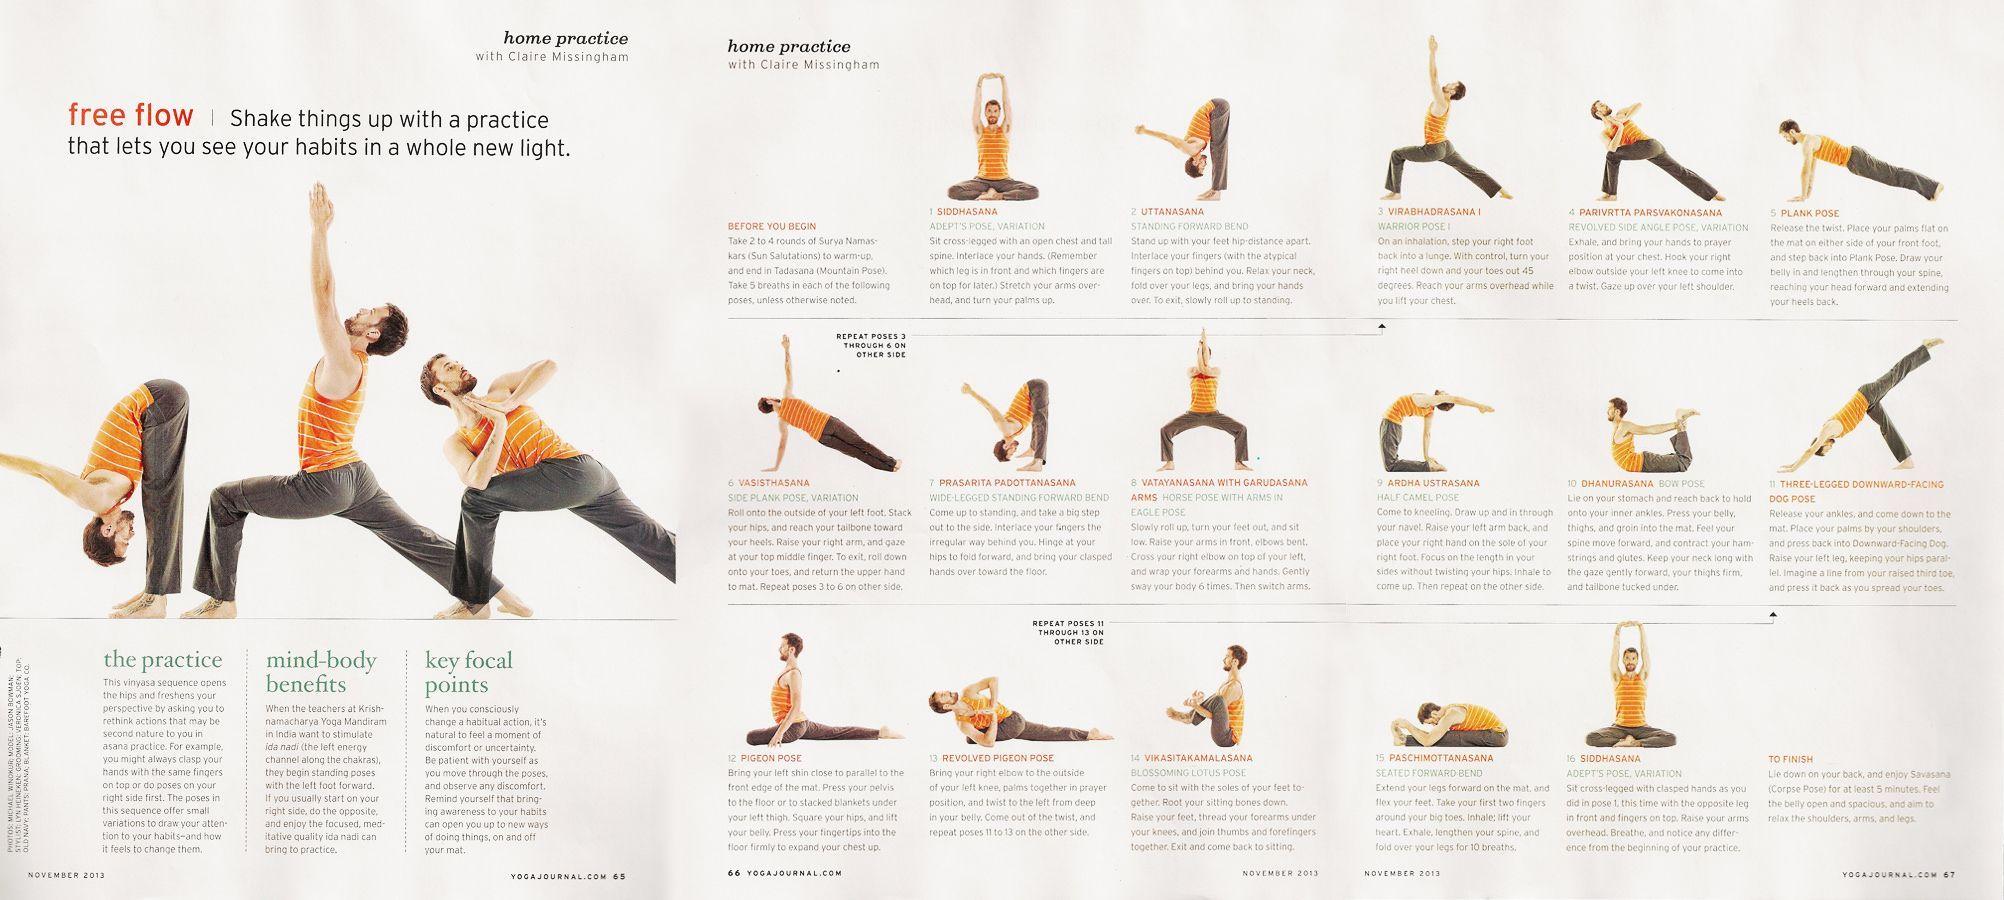 Image Result For Wide Leg Forward Fold Standing Finger Interlaced Behind Back Yoga Journal Yoga Flow Sequence Yoga Flow